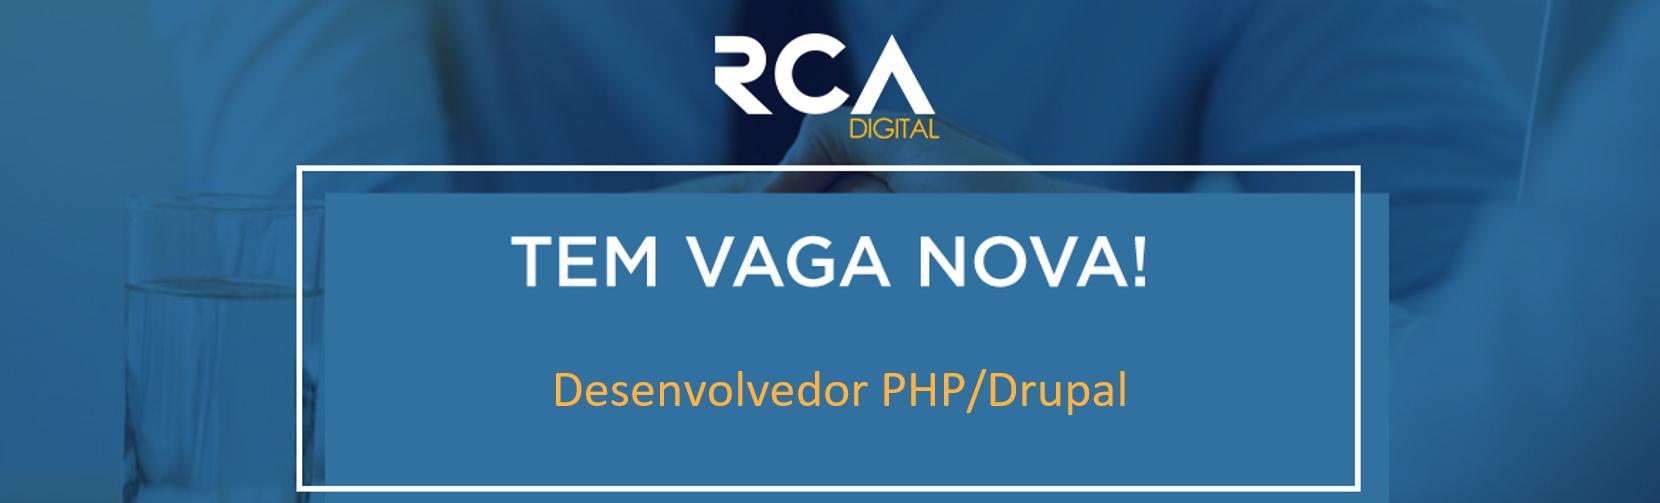 [RCA] - Desenvolvedor PHP / Drupal